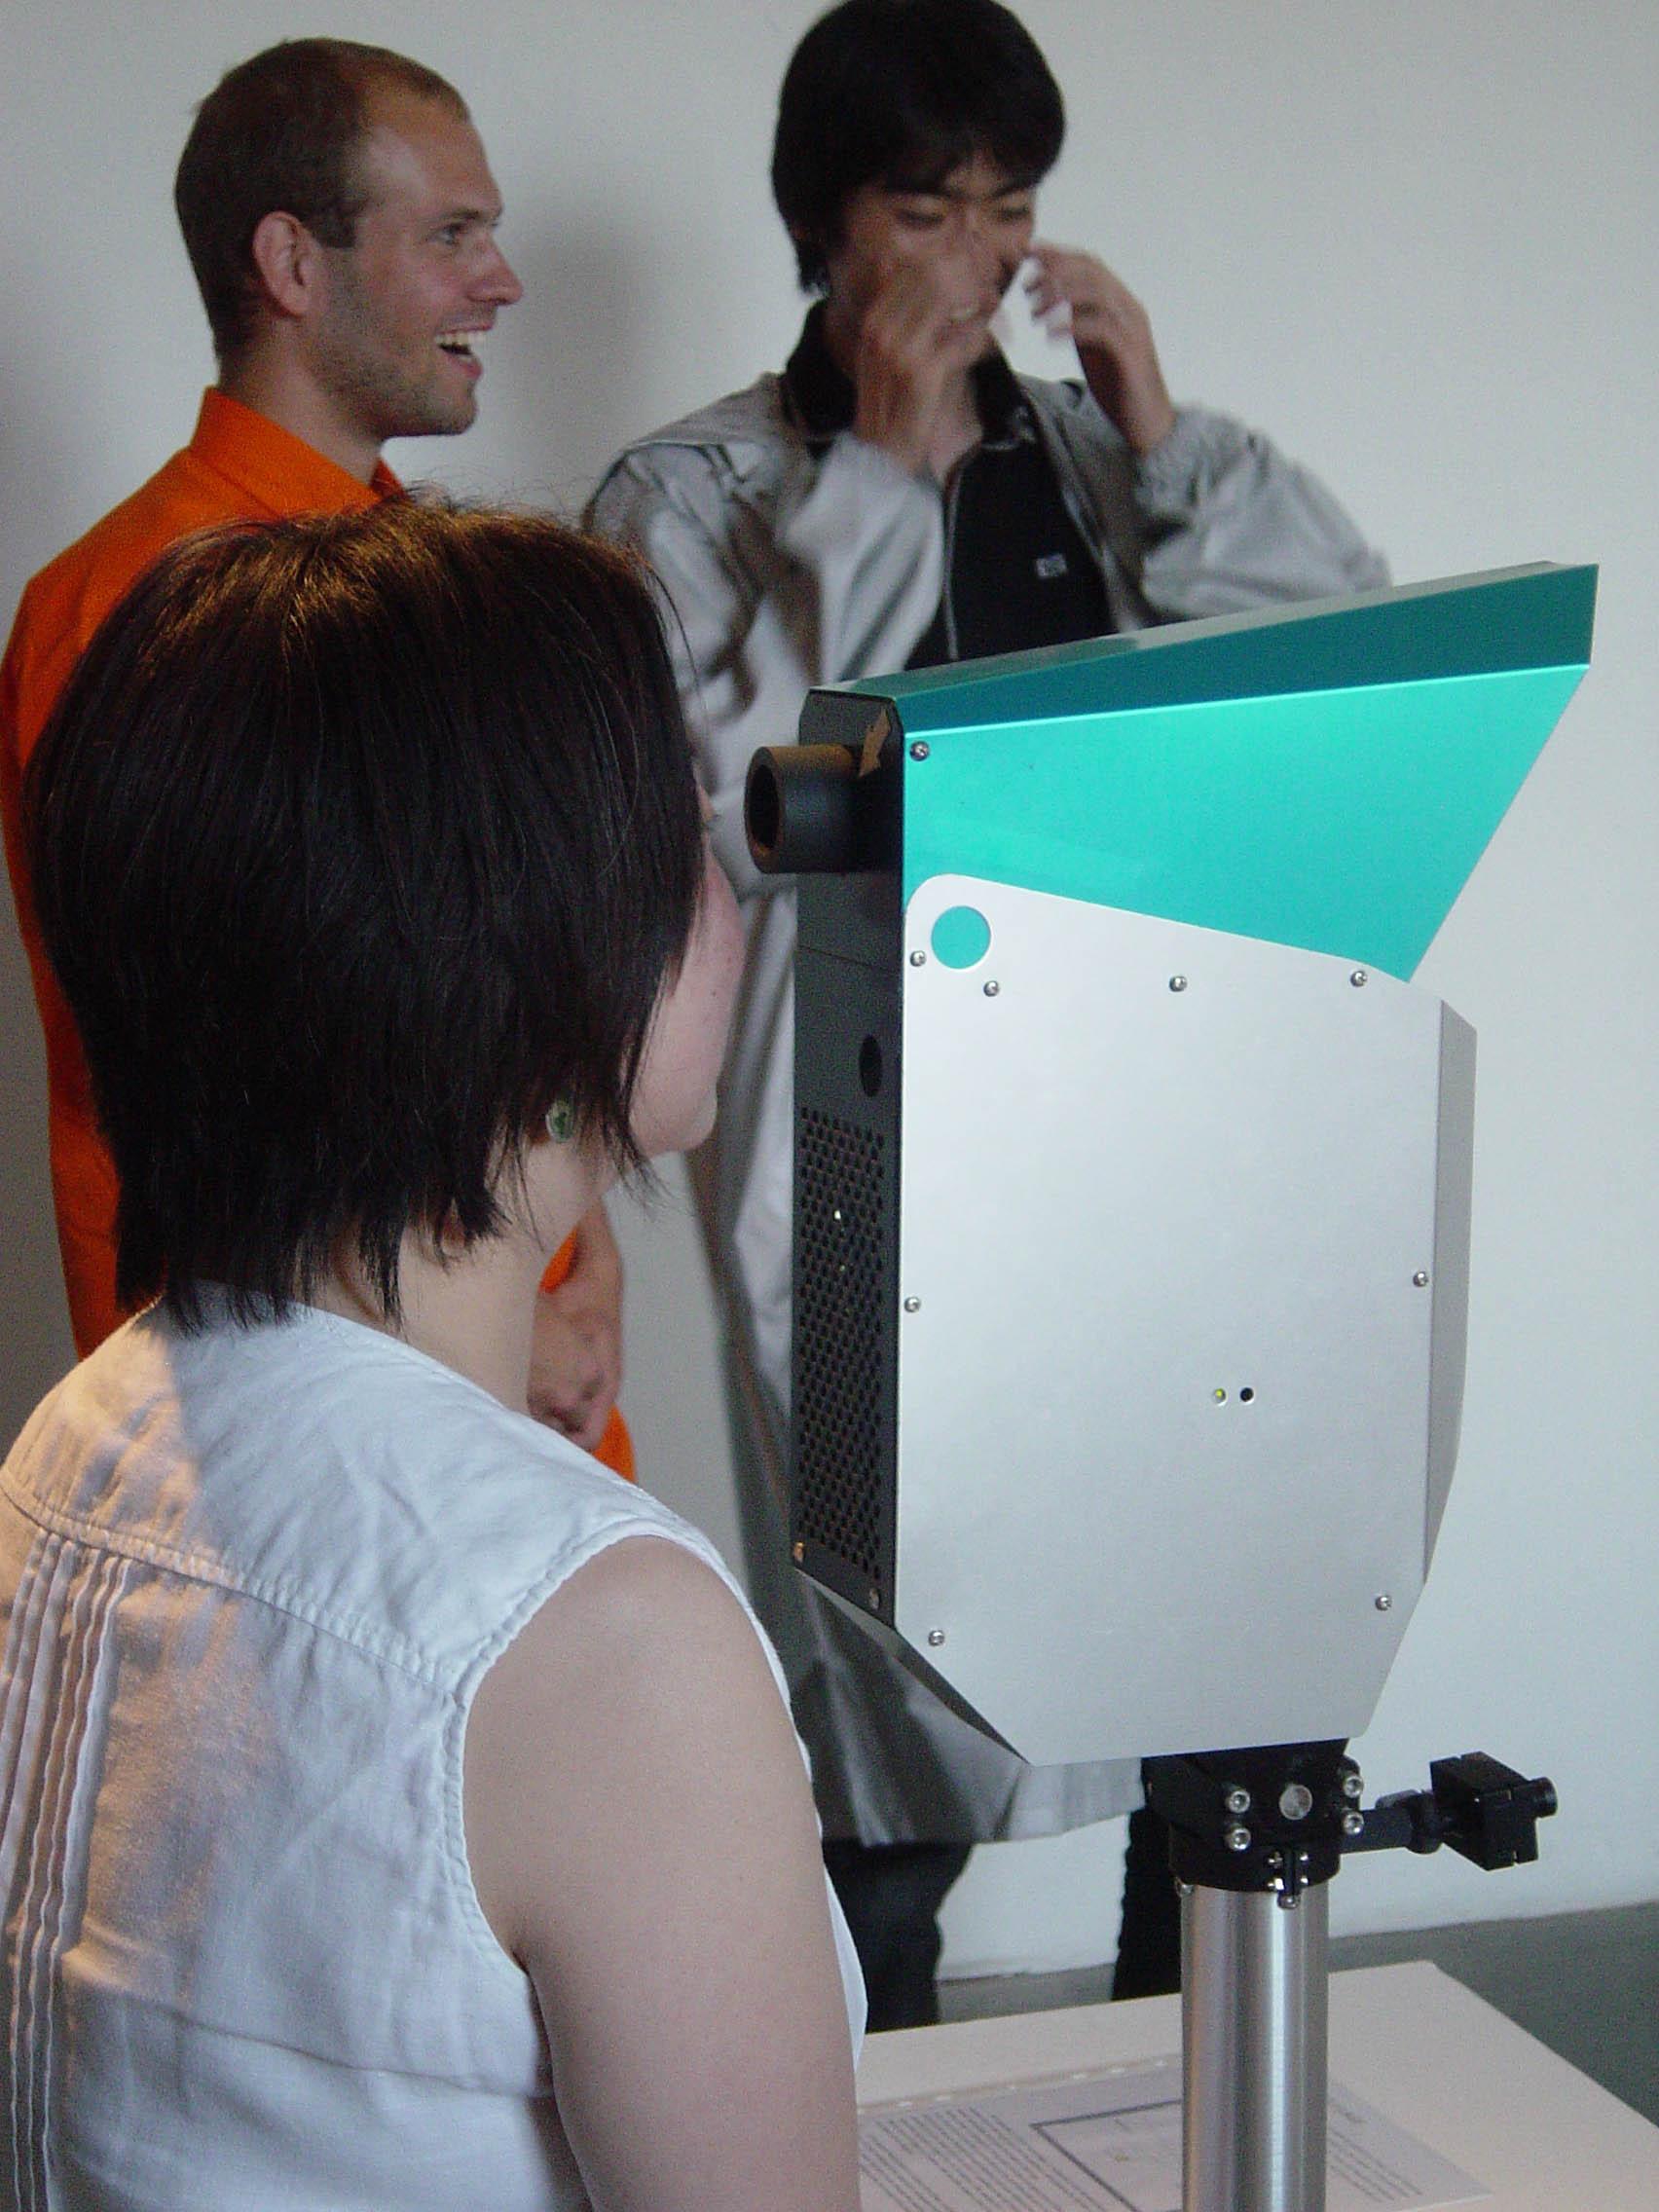 IWI 2008 lightbox image 6.JPG